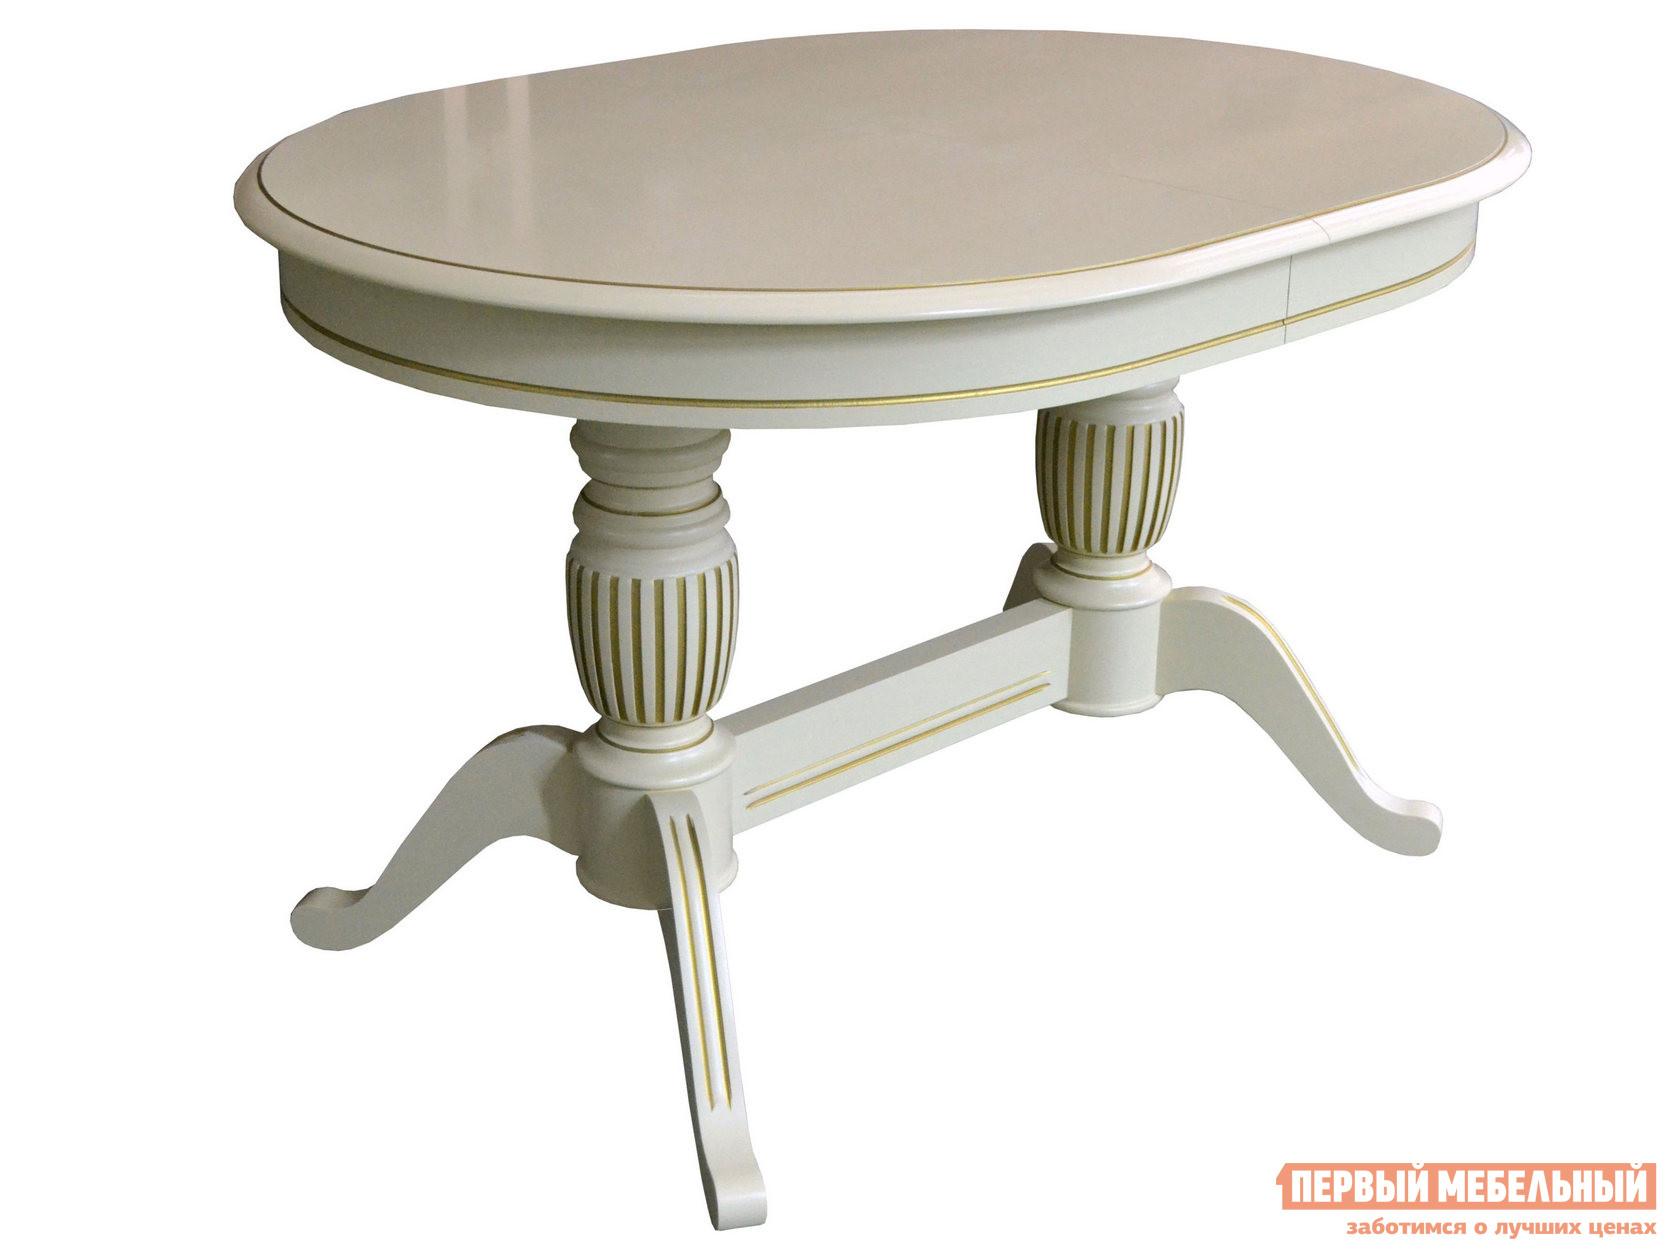 Обеденный стол Линоторг Стол Леонардо 2 овал стол обеденный avanti mix 2